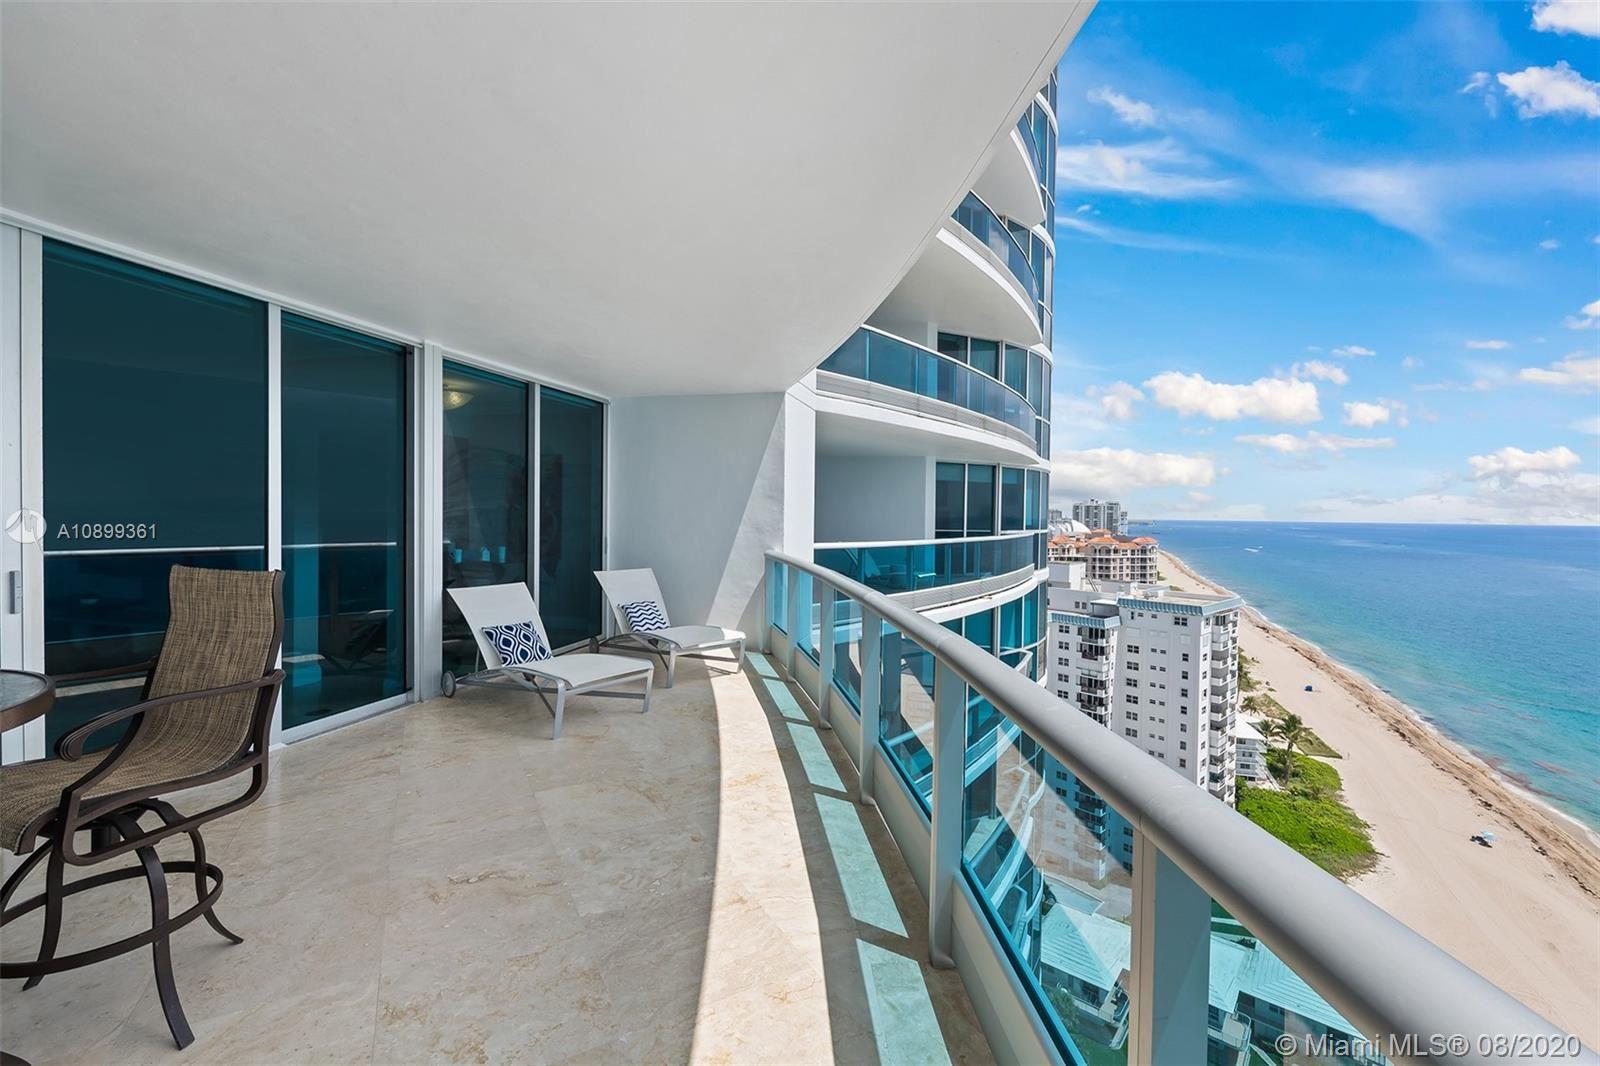 1600 S Ocean Blvd #2002, Lauderdale by the Sea, FL 33062 - #: A10899361